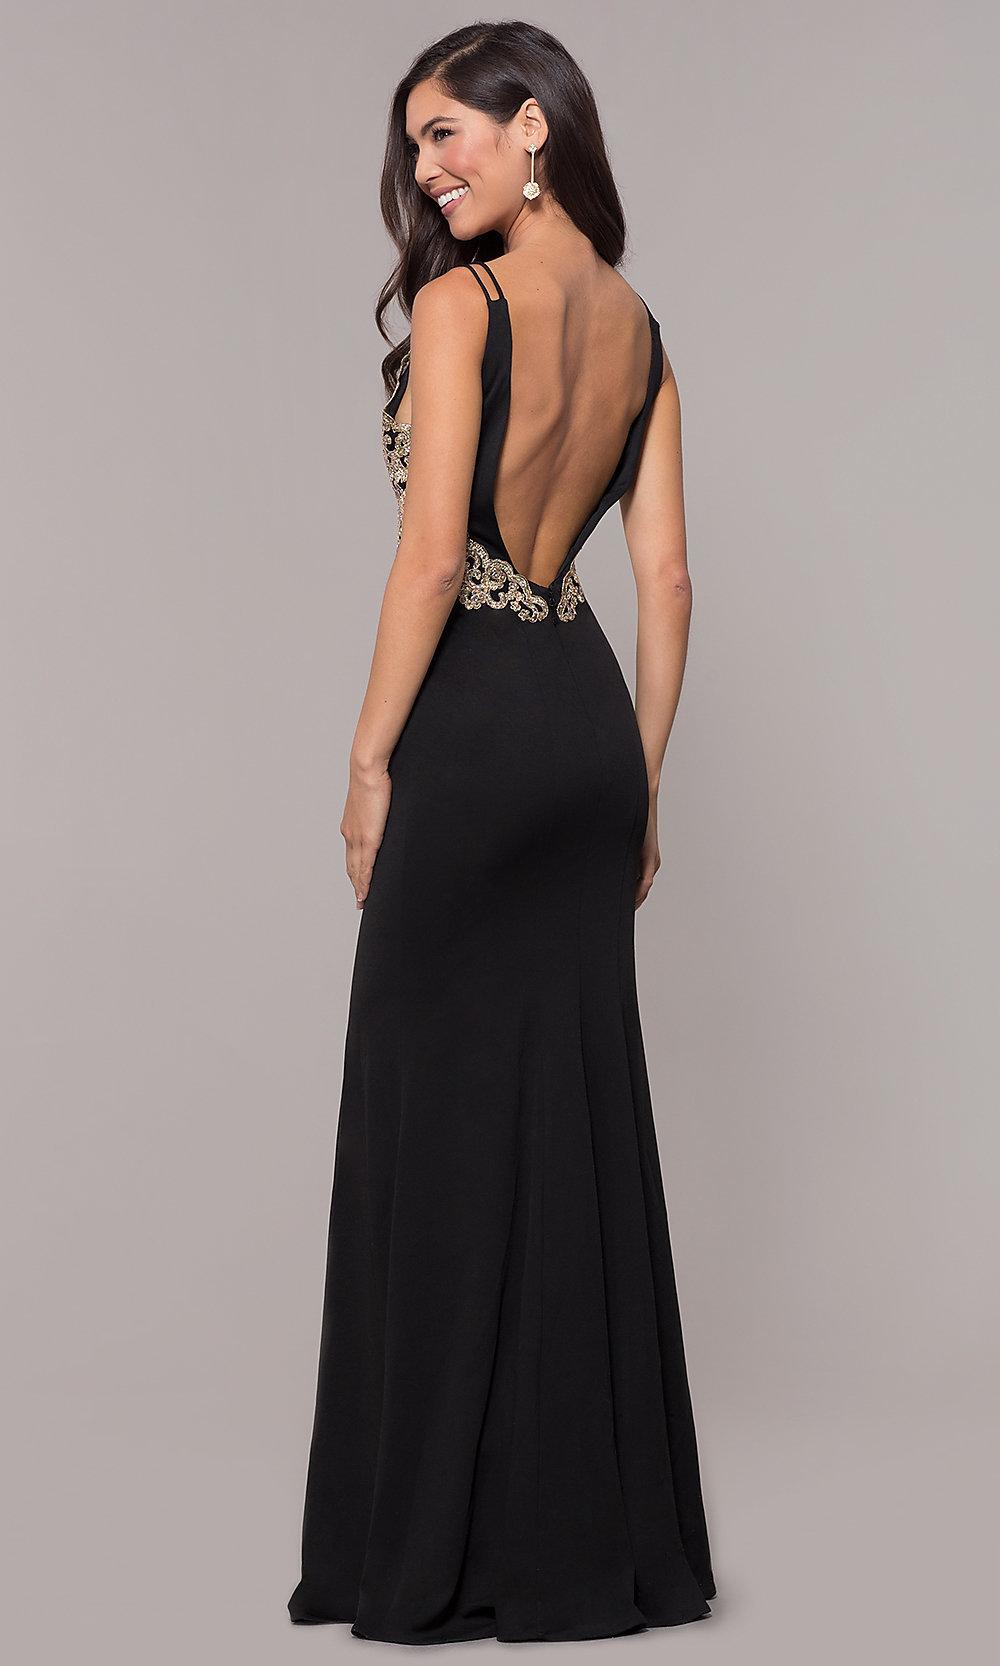 long V-neck blacked prom dress back-side